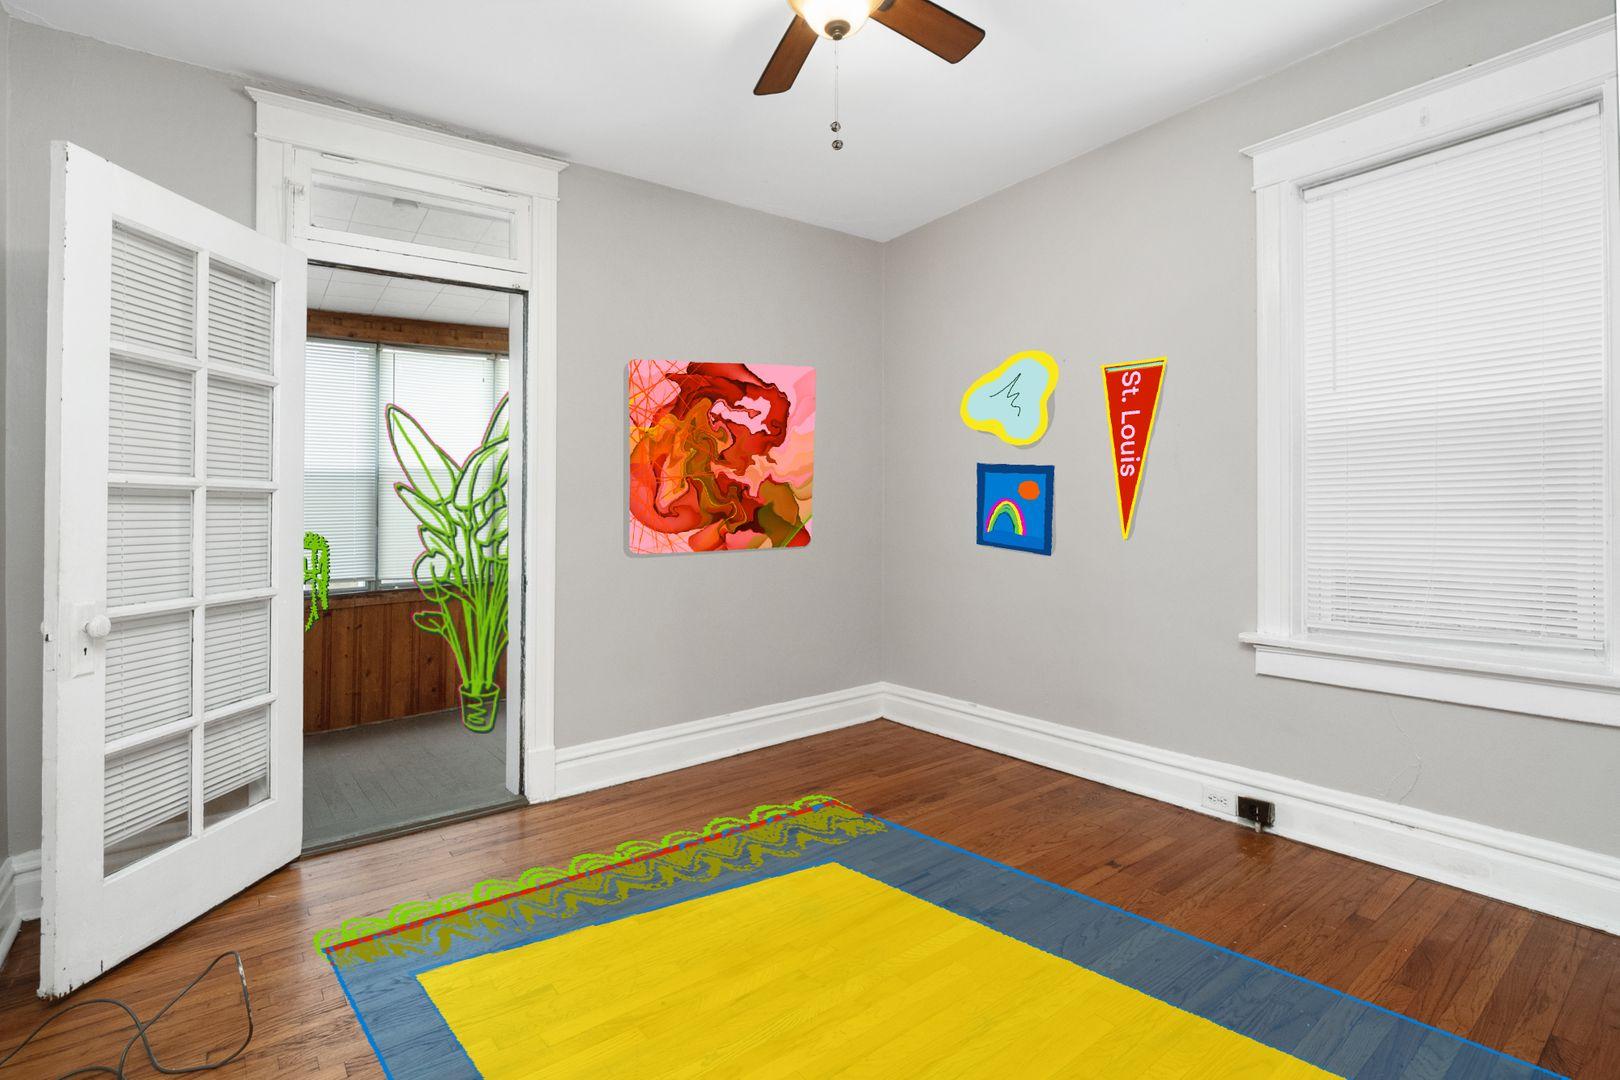 classic apartment with illustrations superimposed